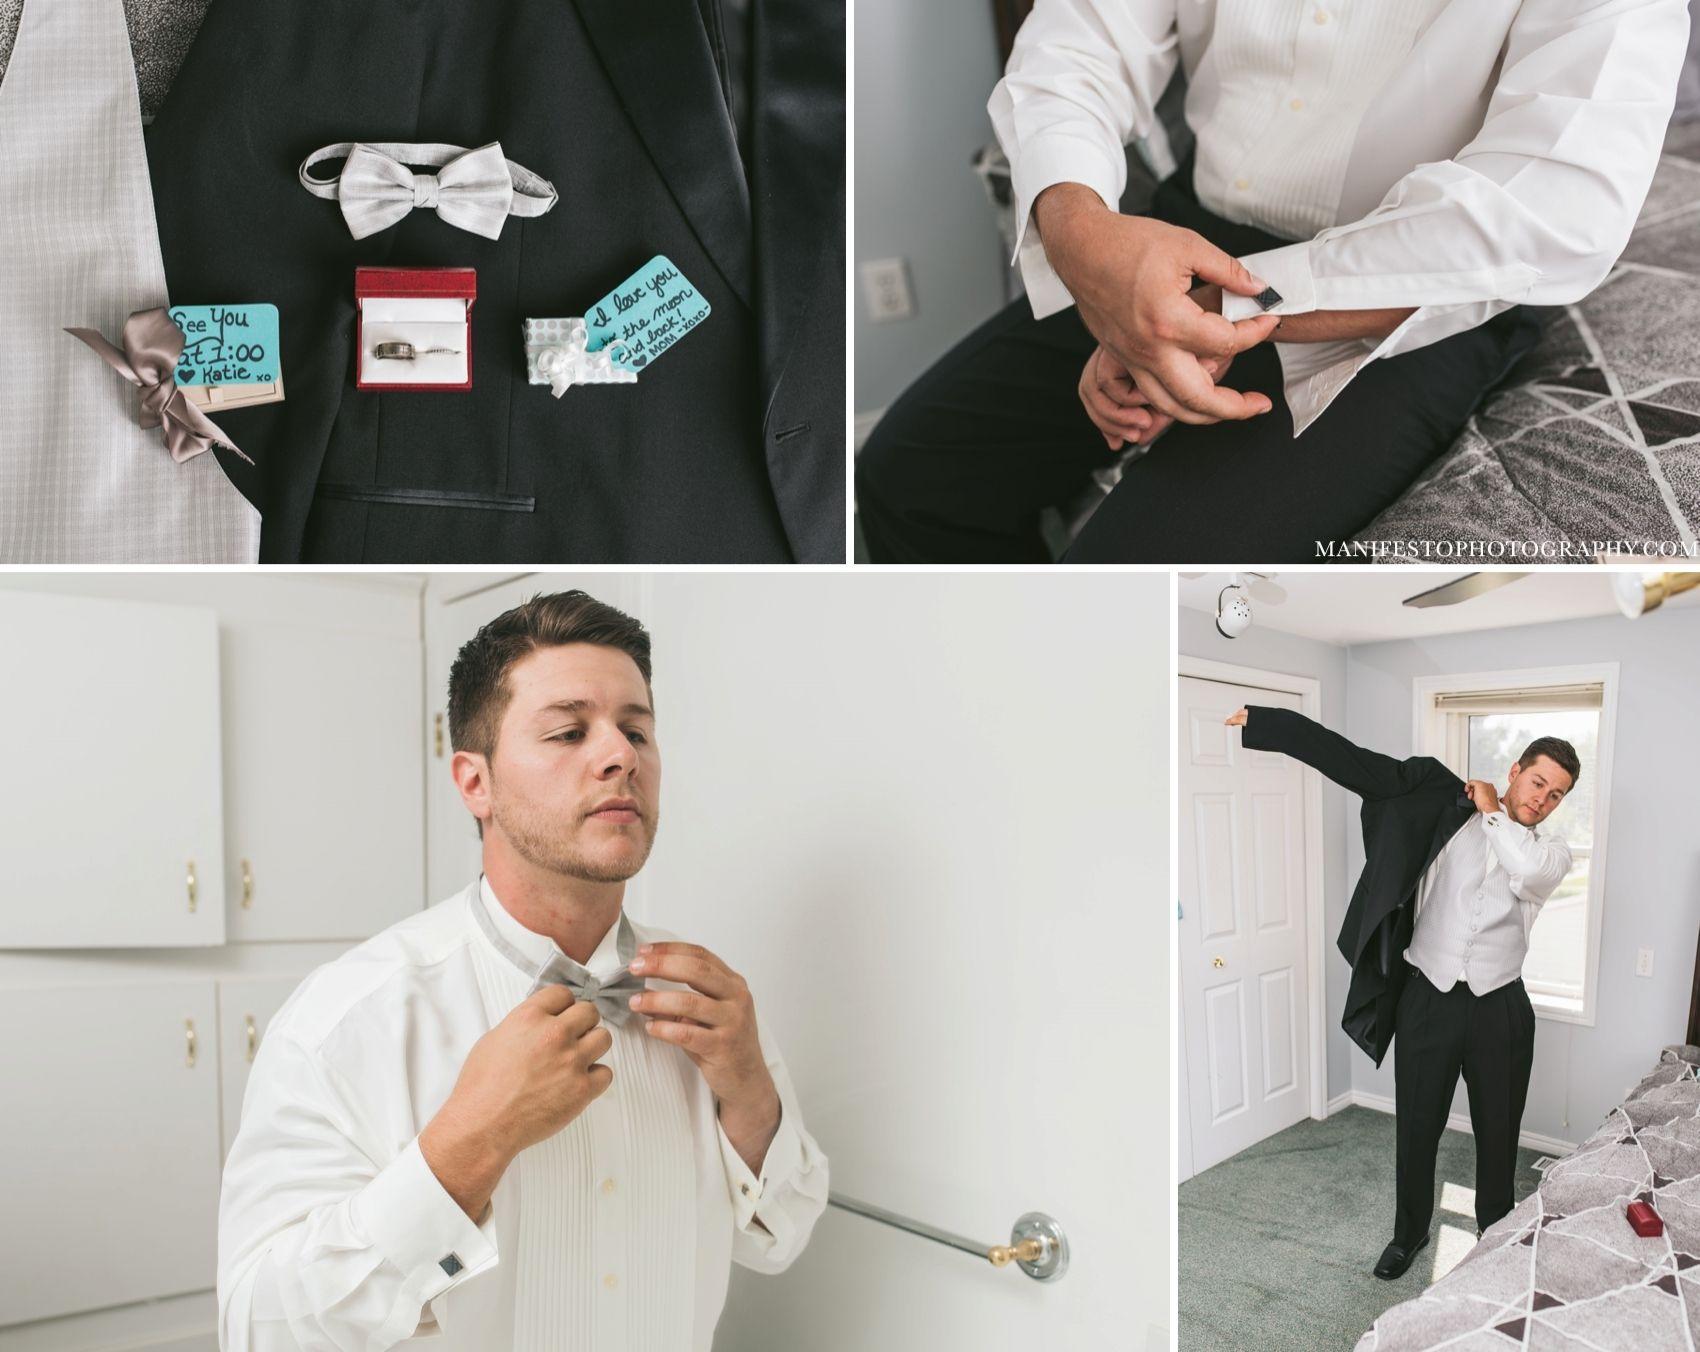 Manifesto Wedding Photography | Windsor, Ontario | Wedding Photographer, Joshua & Arica Klassen | Serving Windsor, London, Kitchener, Waterlook, Toronto, Canada Wide.